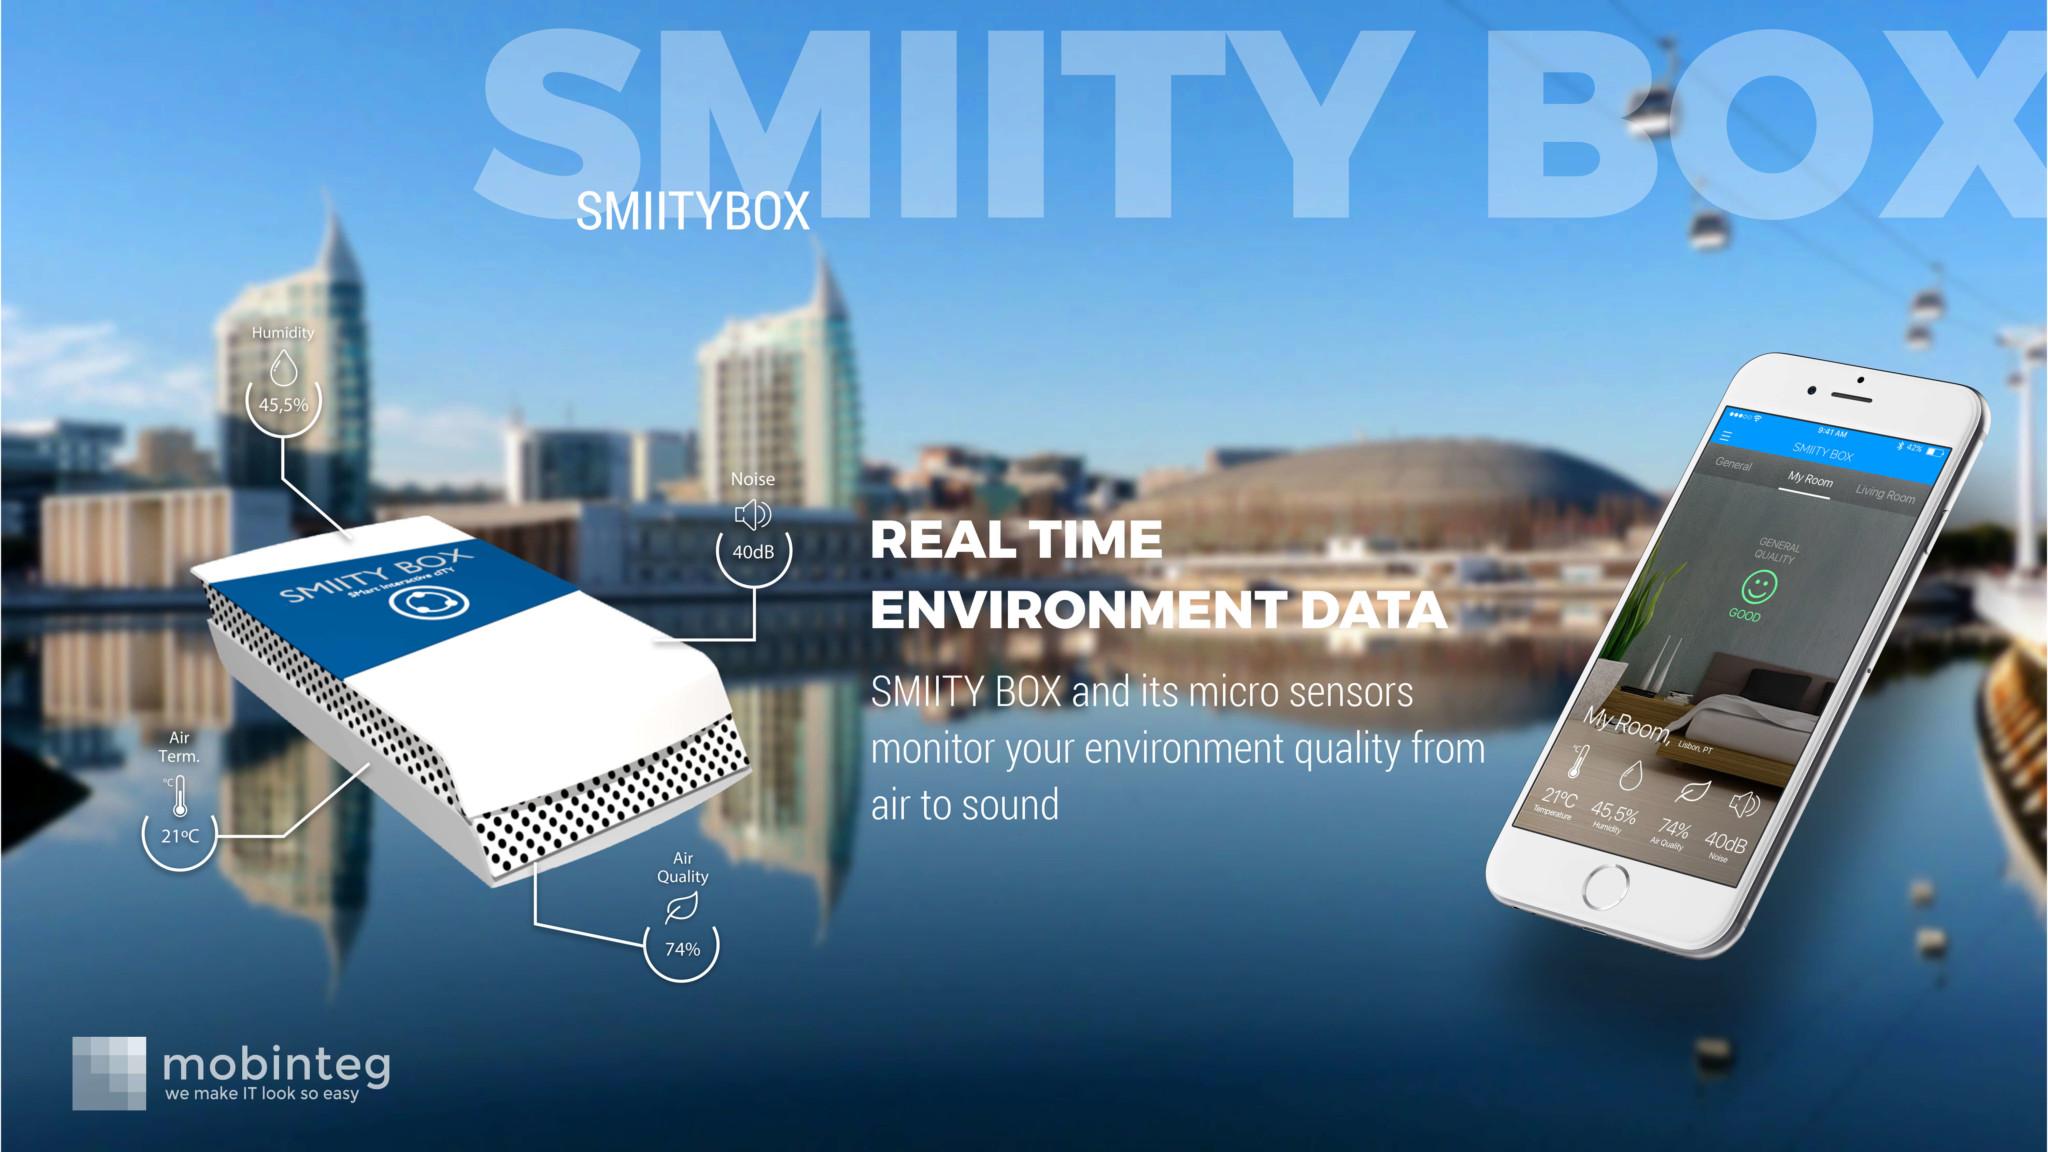 Smiity Box